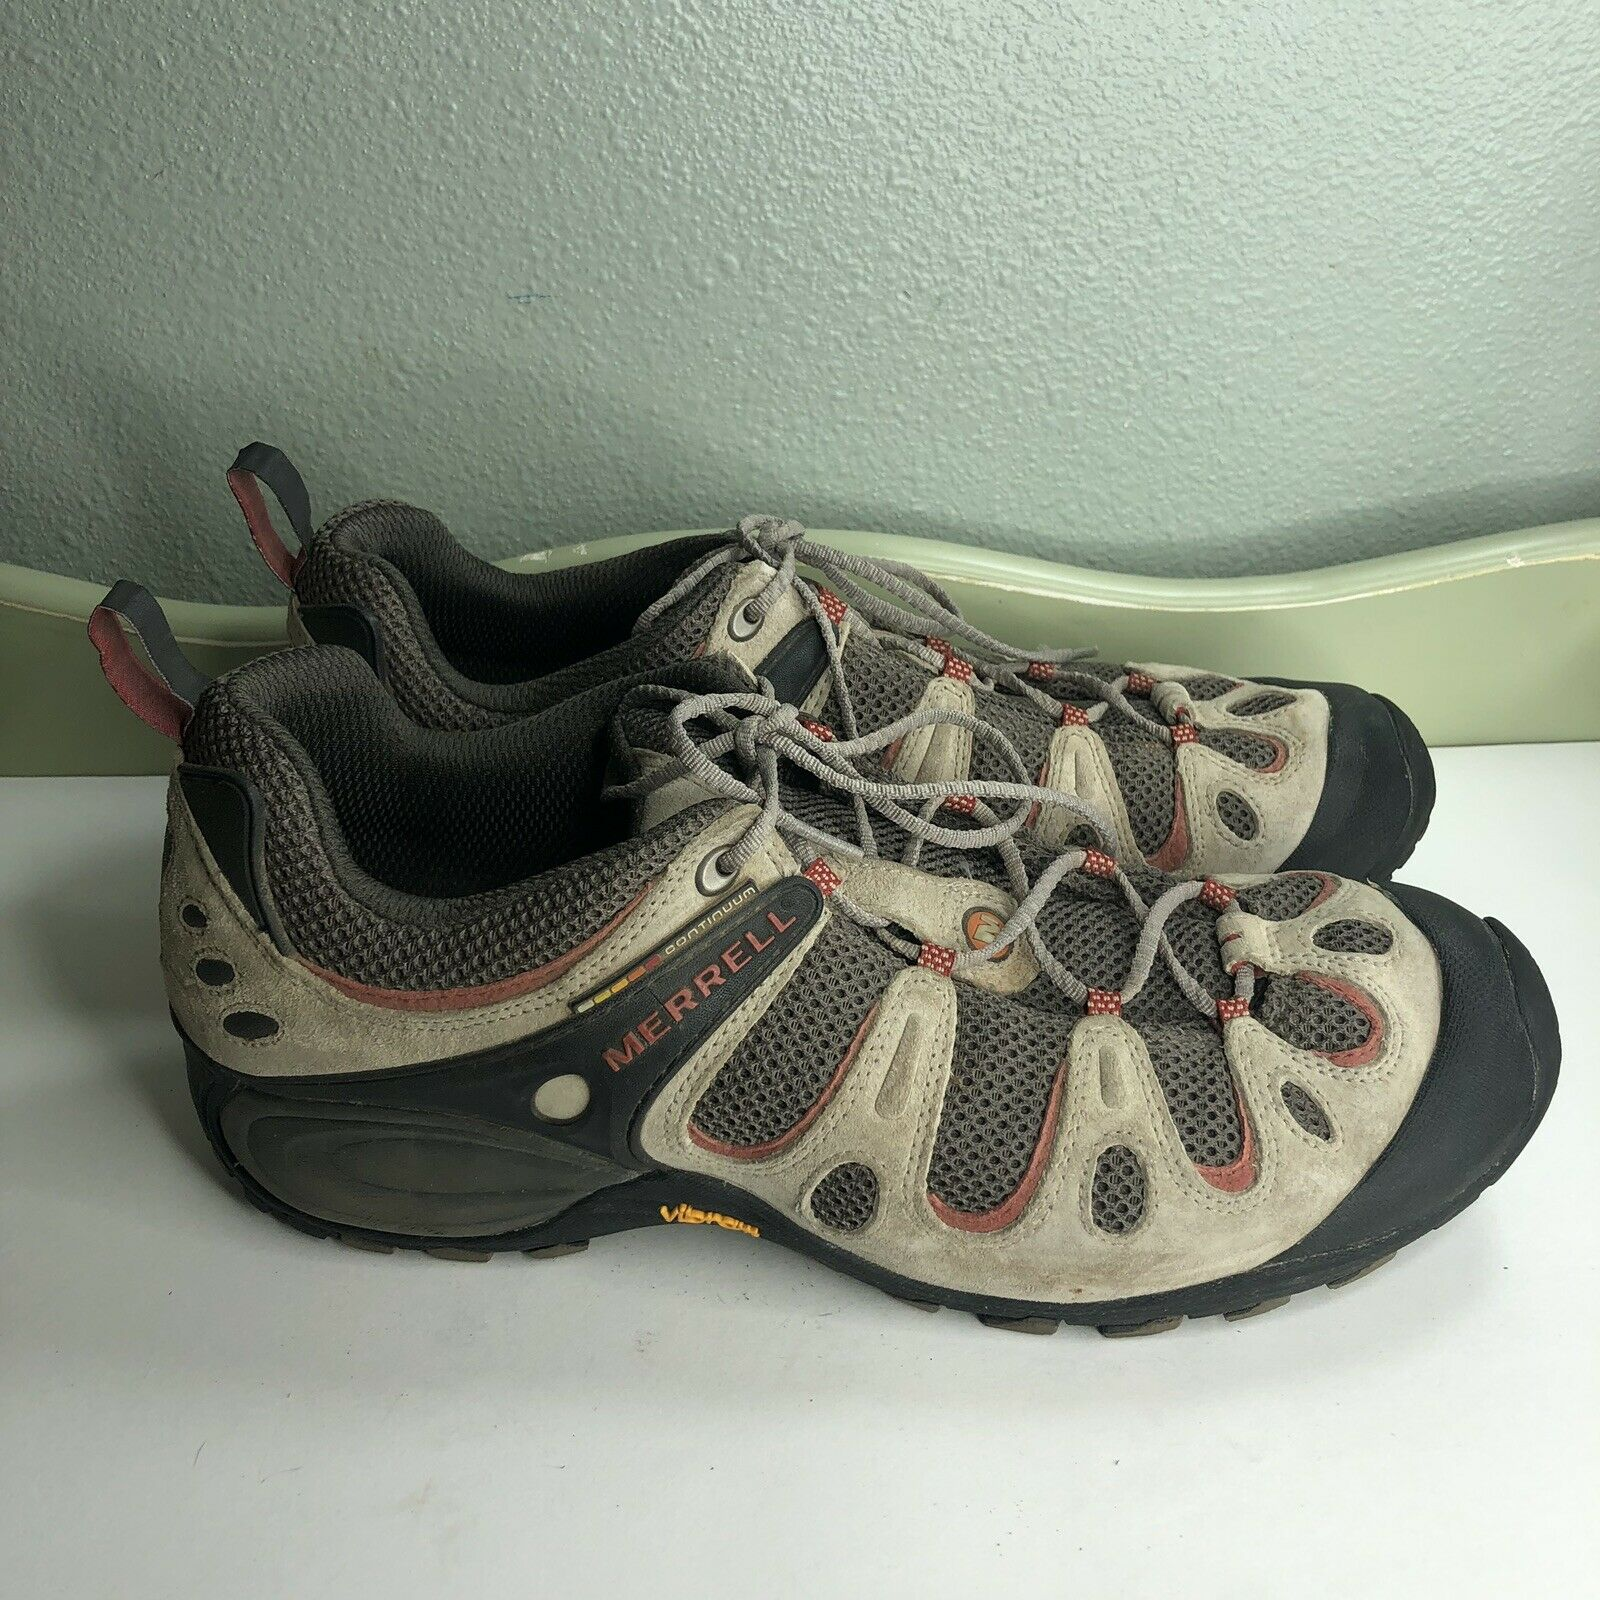 Merrell Chameleon Hiking scarpe Men Dimensione 14 Walking